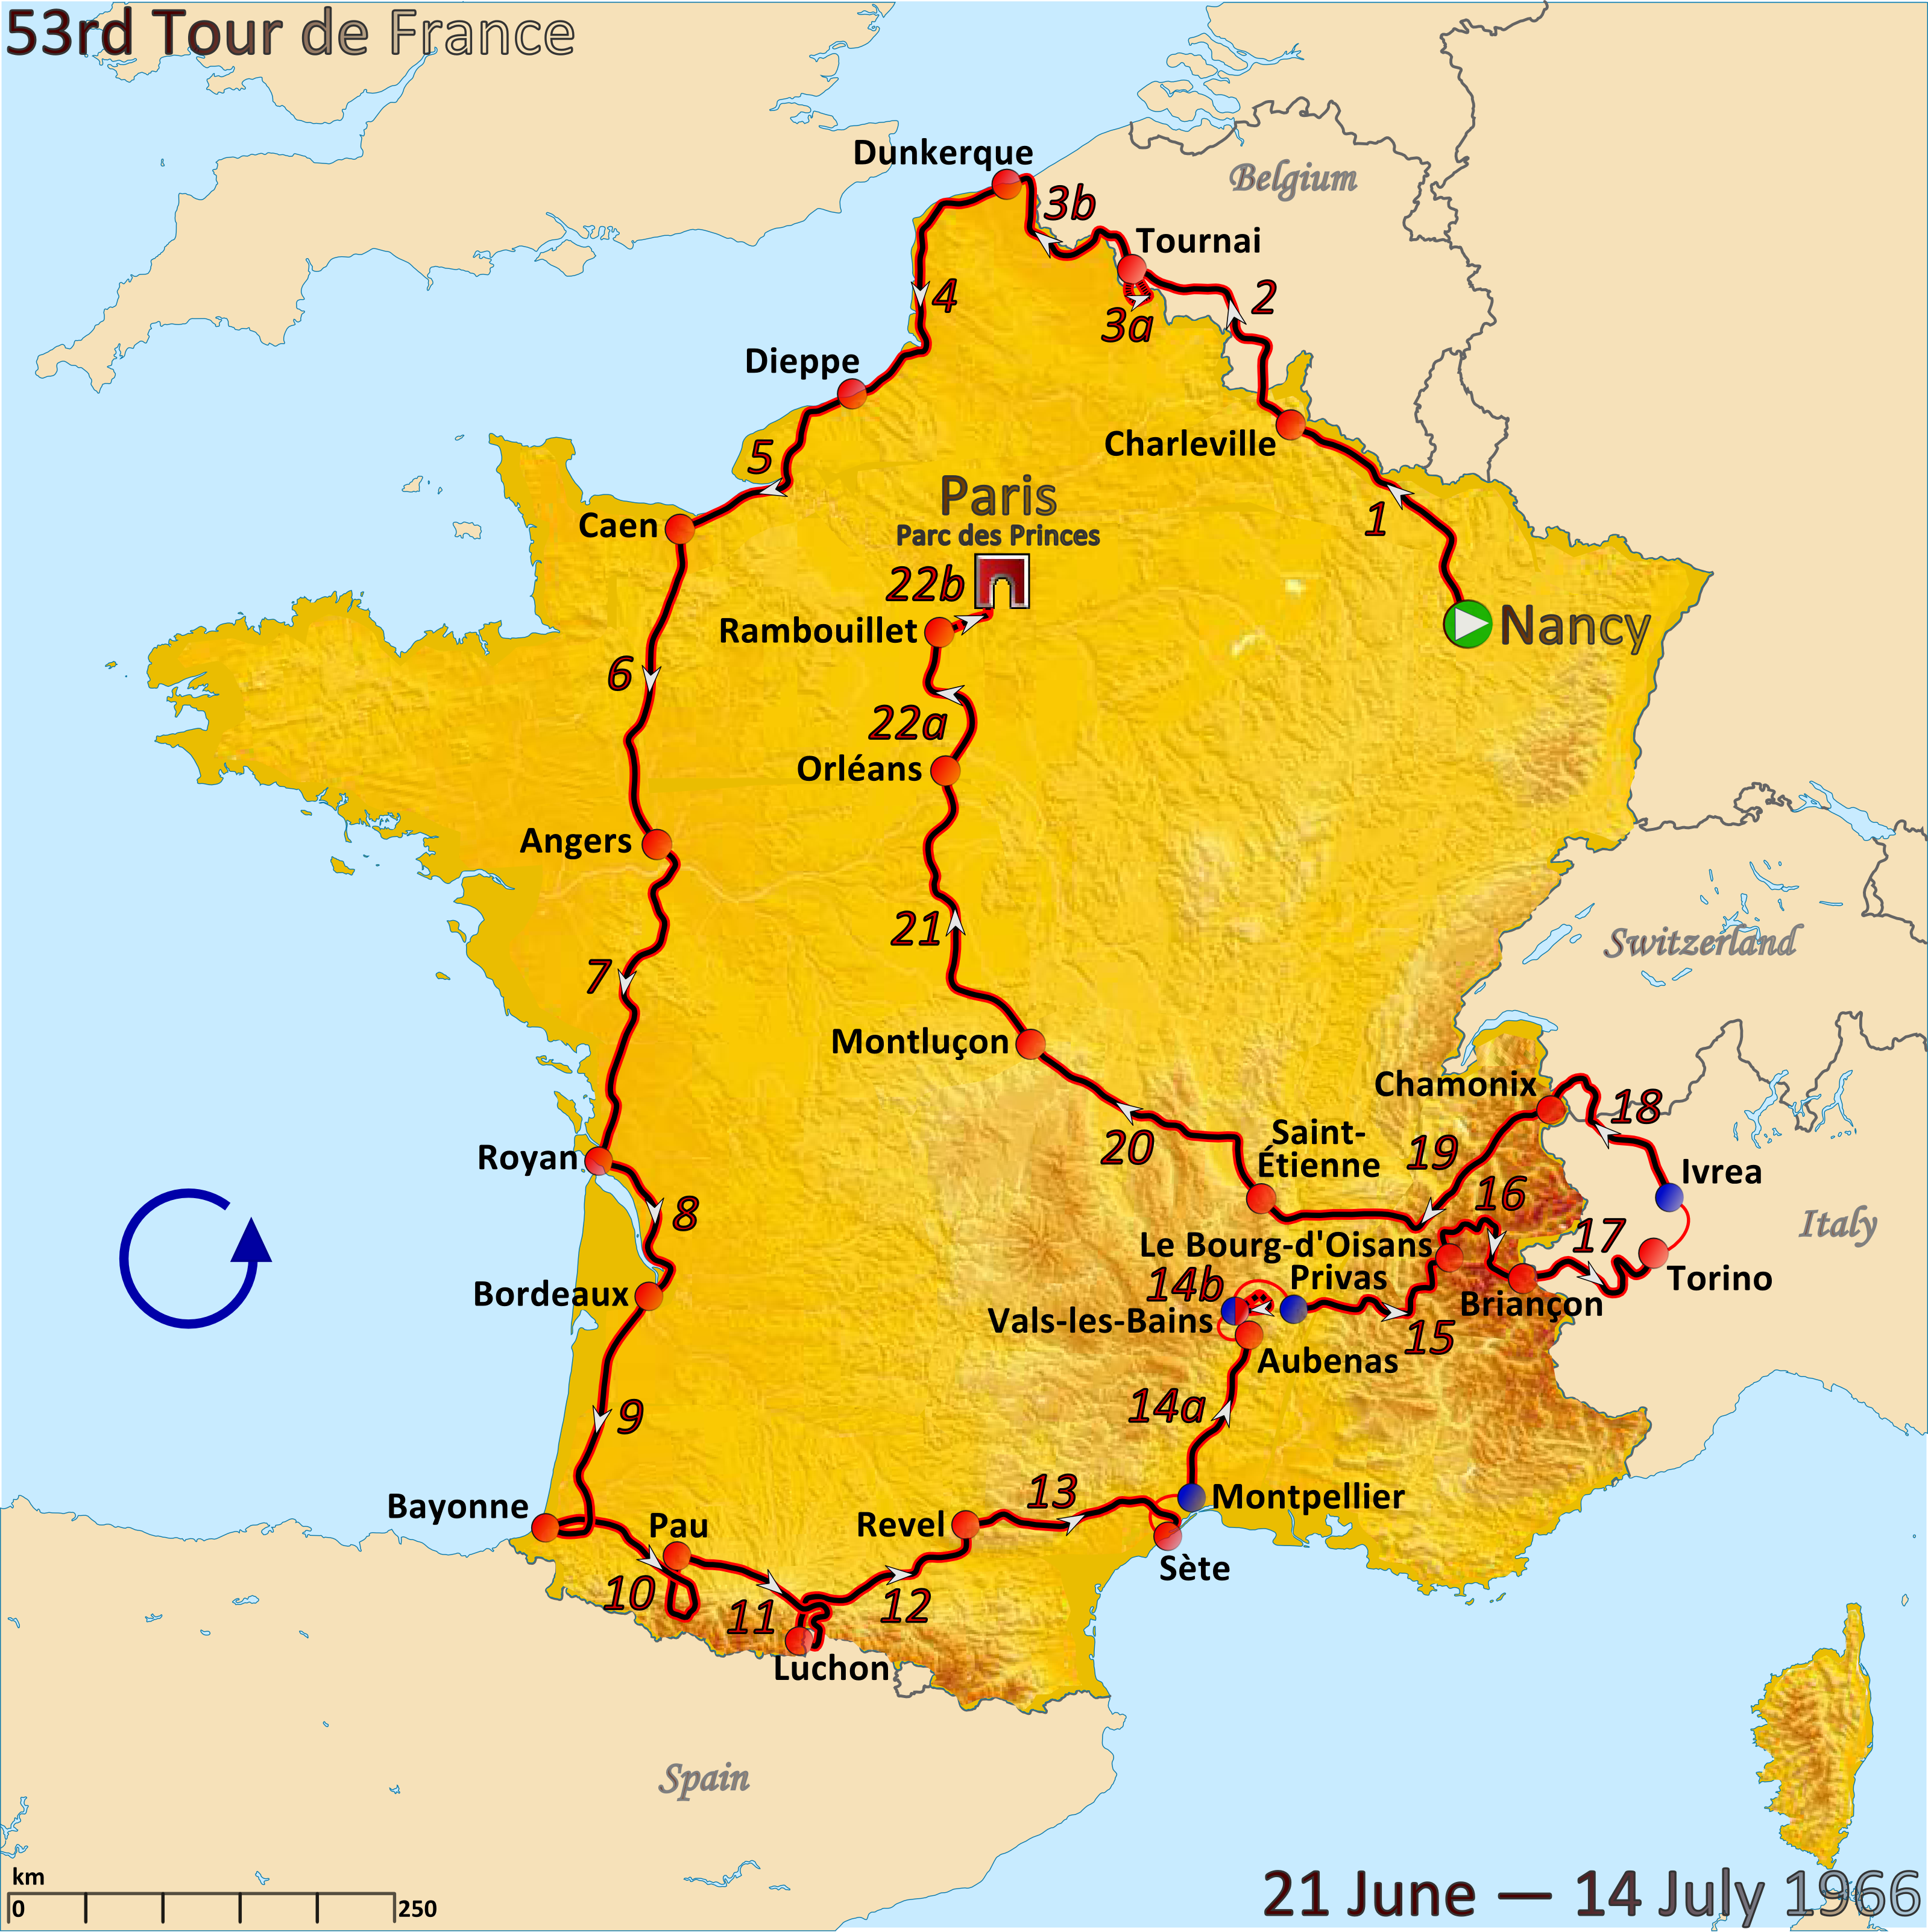 1966 tour de france - wikipedia